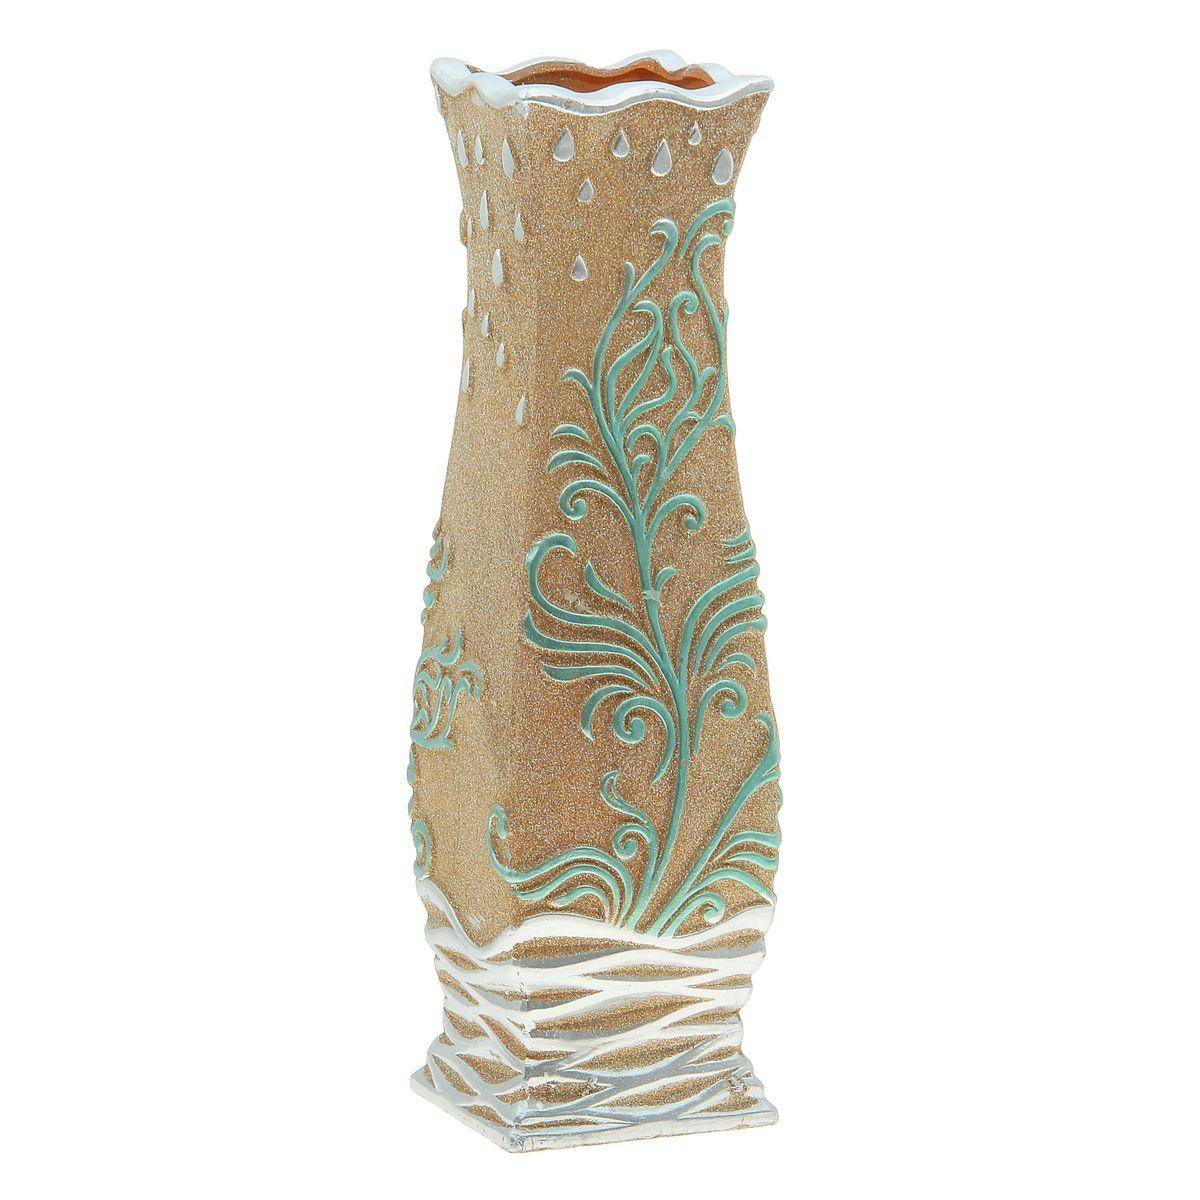 Ваза керамика напольная изумрудная посыпка 60 см круглая 920580920580Керамика